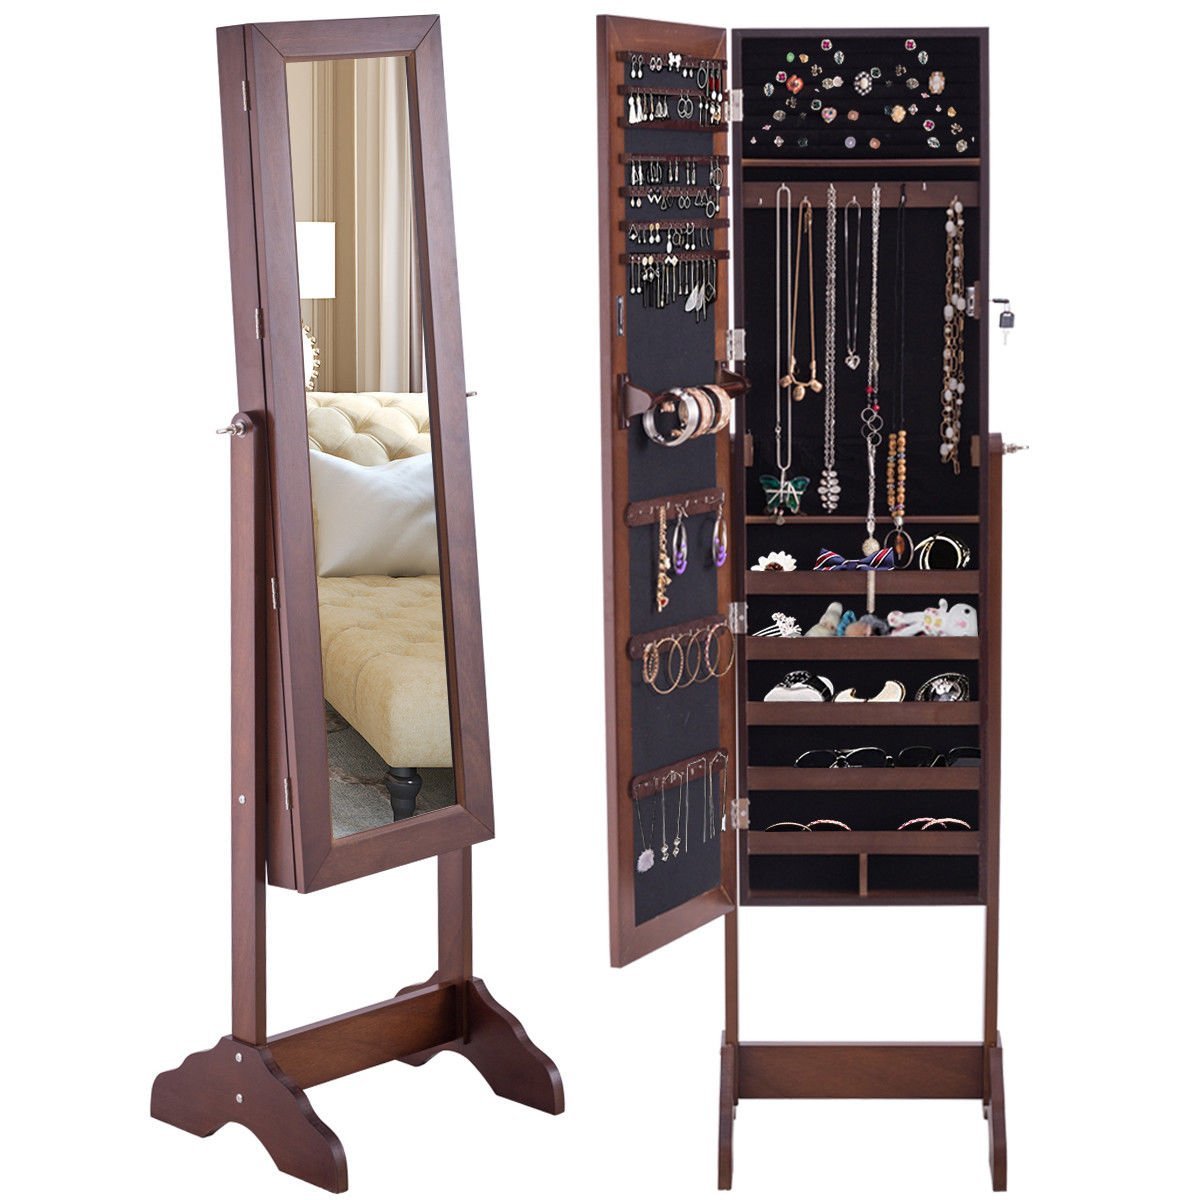 Giantex Mirrored Jewelry Cabinet Armoire Storage Organizer Box w/Lockable Adjustable Stand